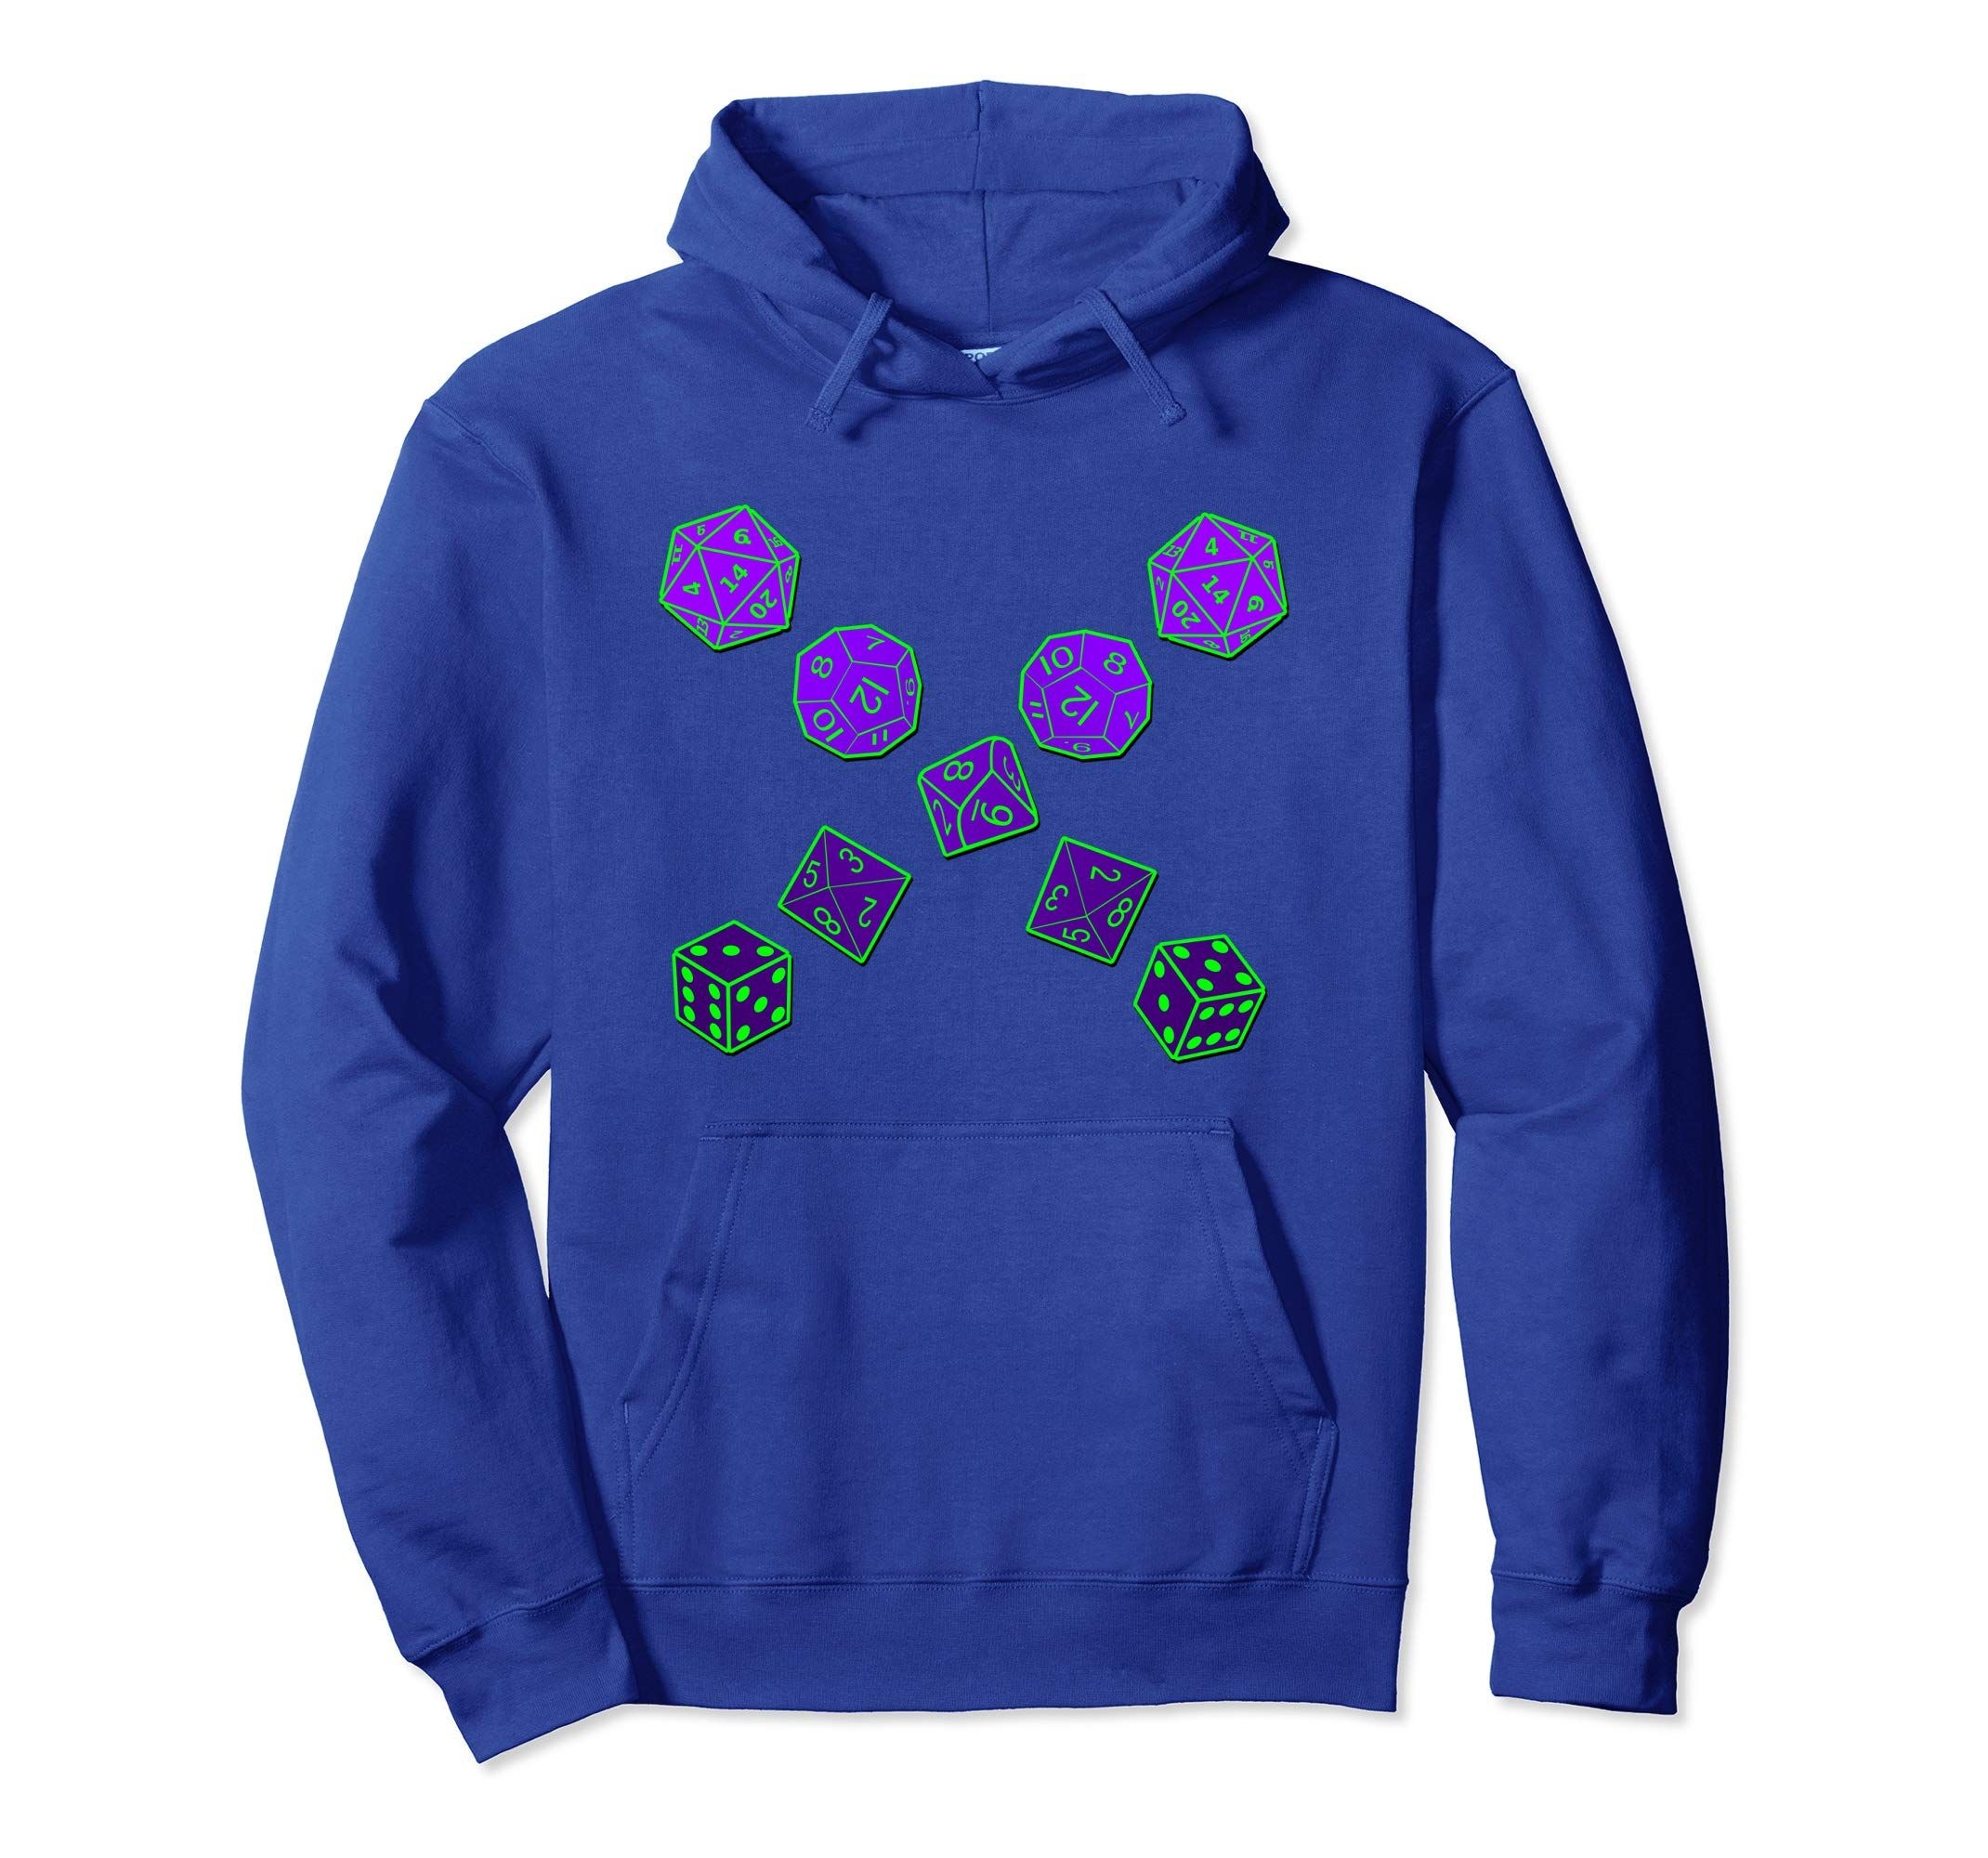 Coto7 Girl Power Flowers Kids Hooded Sweatshirt